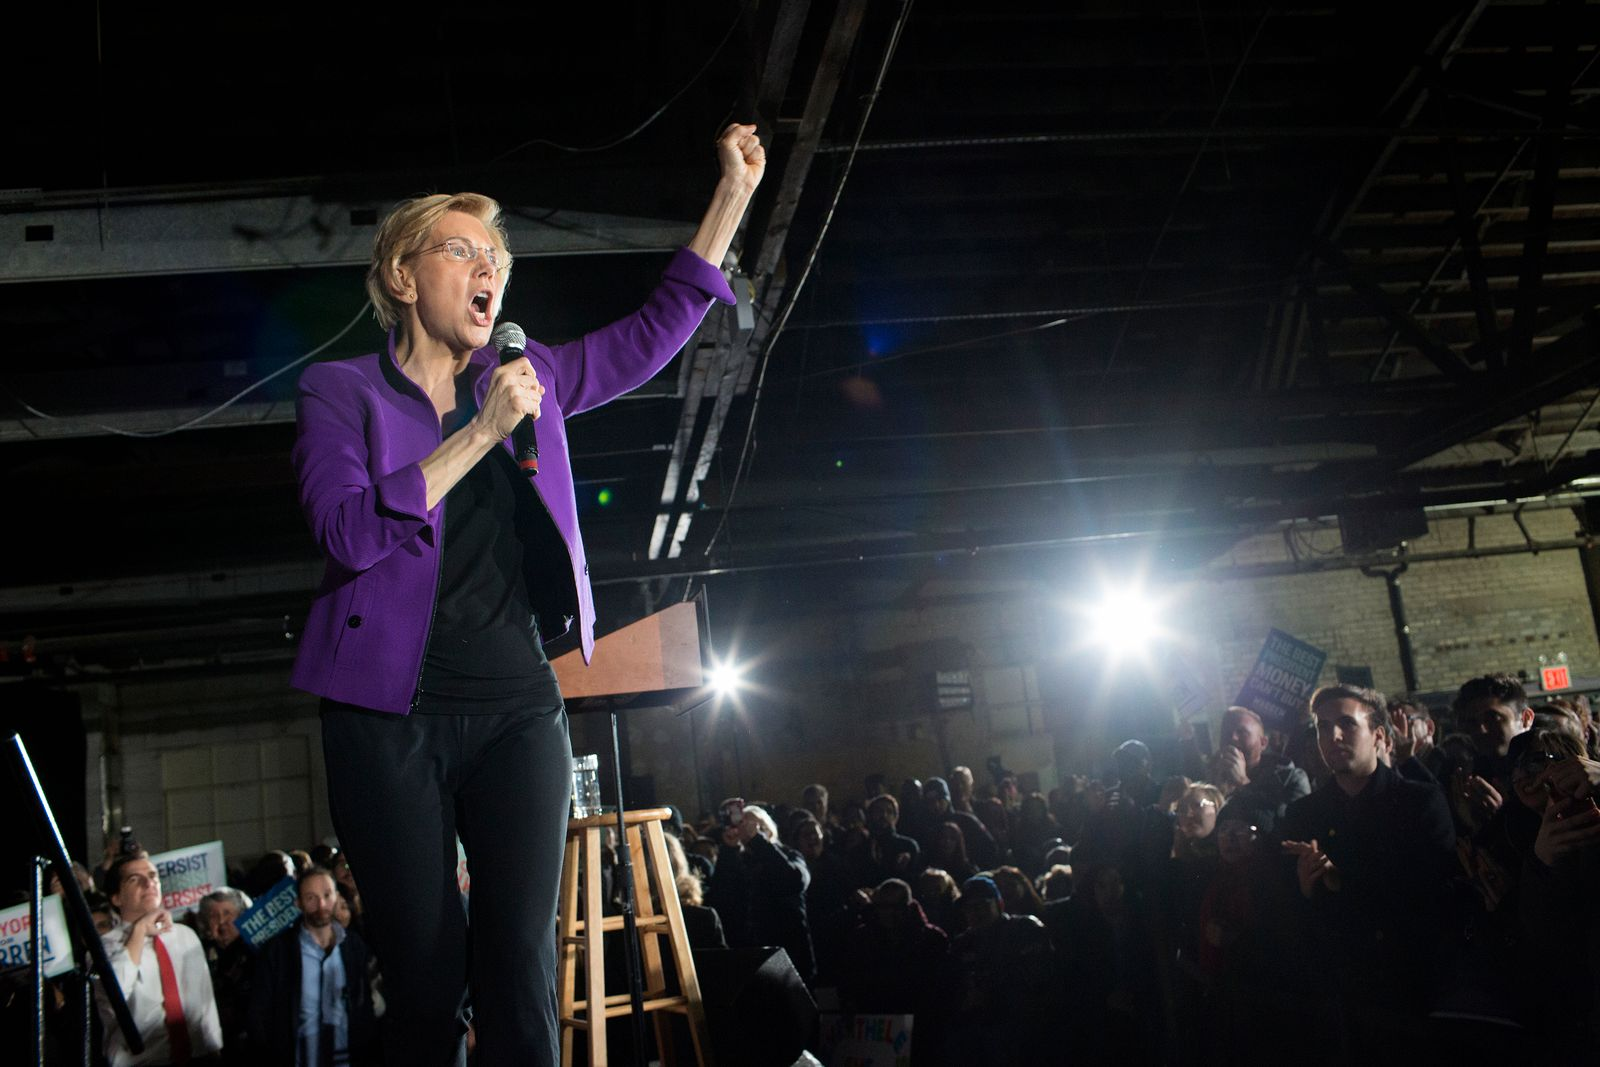 Elizabeth Warren presidential campaign rally in Long Island City, Queens